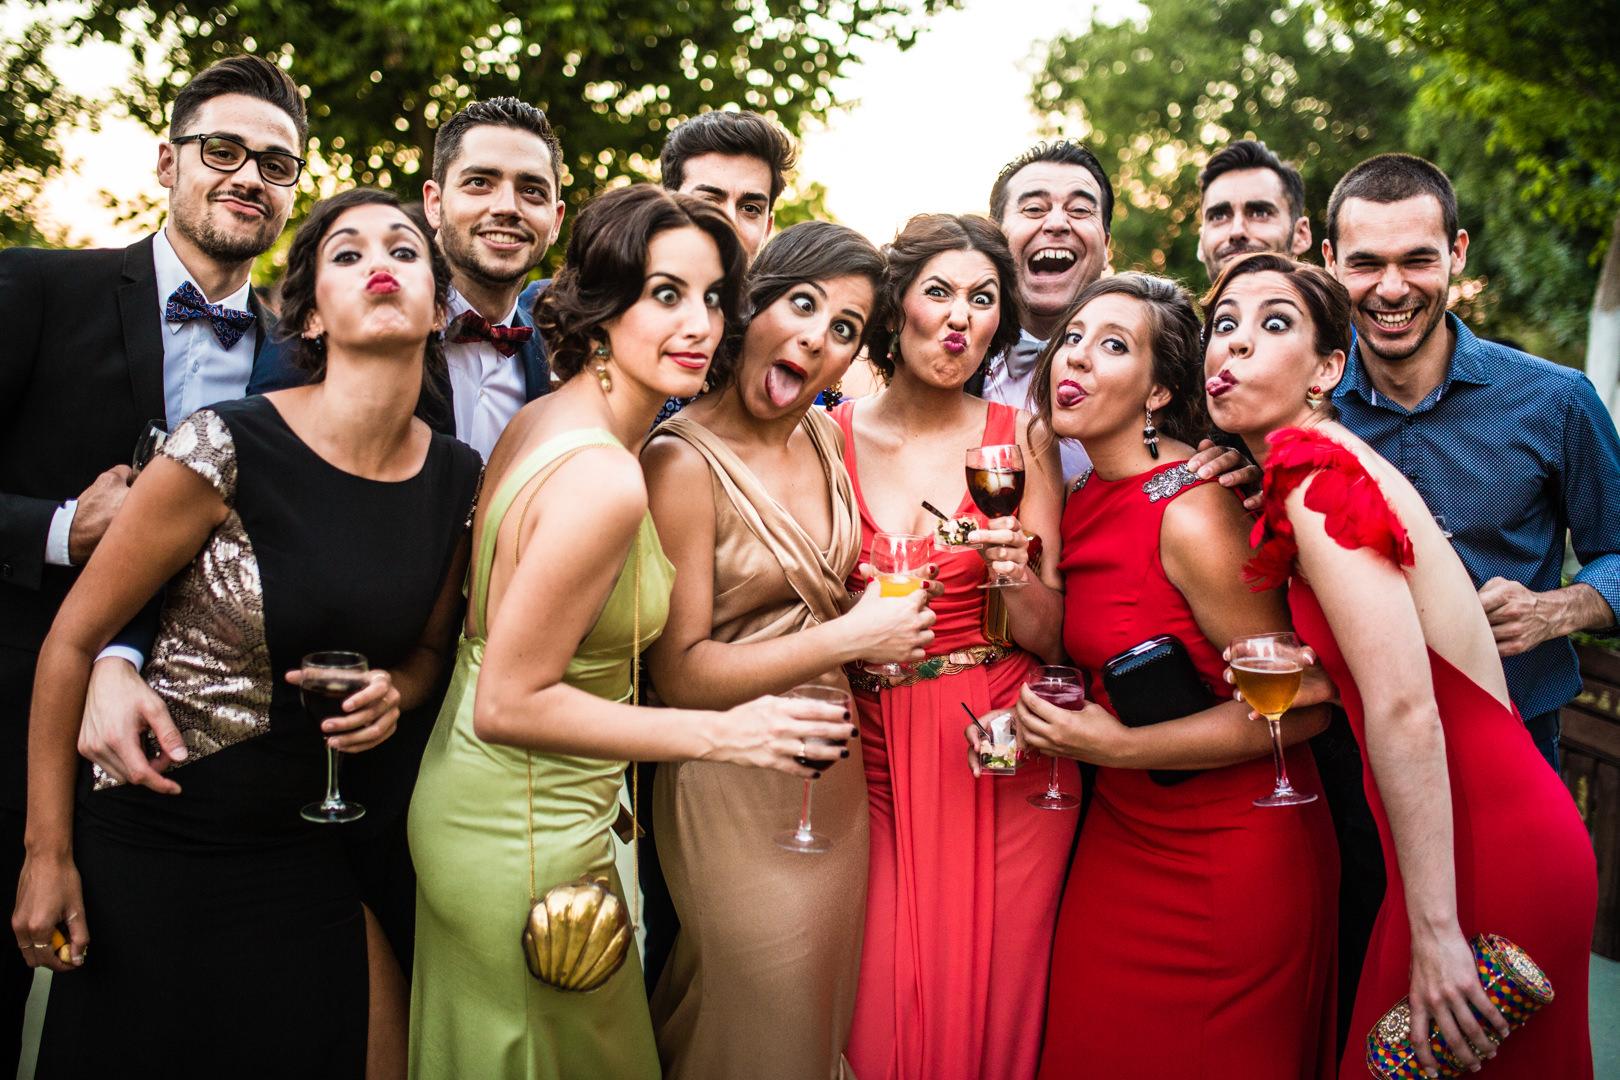 Boda-Sevilla-Museo-Carmona-Hamburgo-Maria-Carles-engagement-Rafael-Torres-fotografo-bodas-sevilla-madrid-barcelona-wedding-photographer--34.jpg